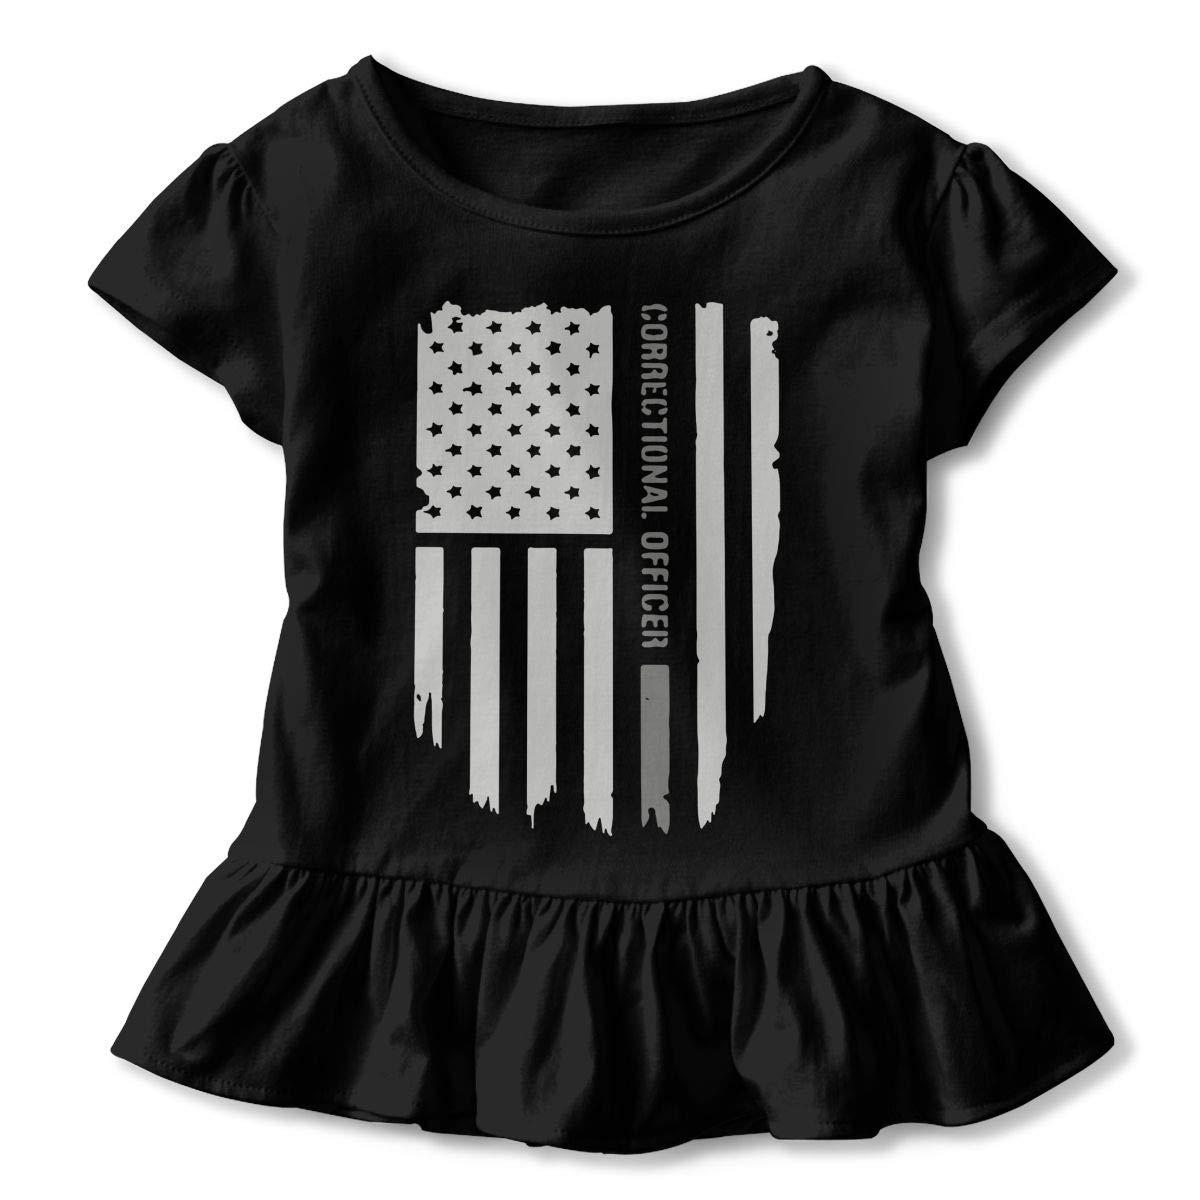 SHIRT1-KIDS Thin Silver Line Correctional Officer Childrens Girls Short Sleeve Shirts Ruffles Shirt Tee for 2-6T